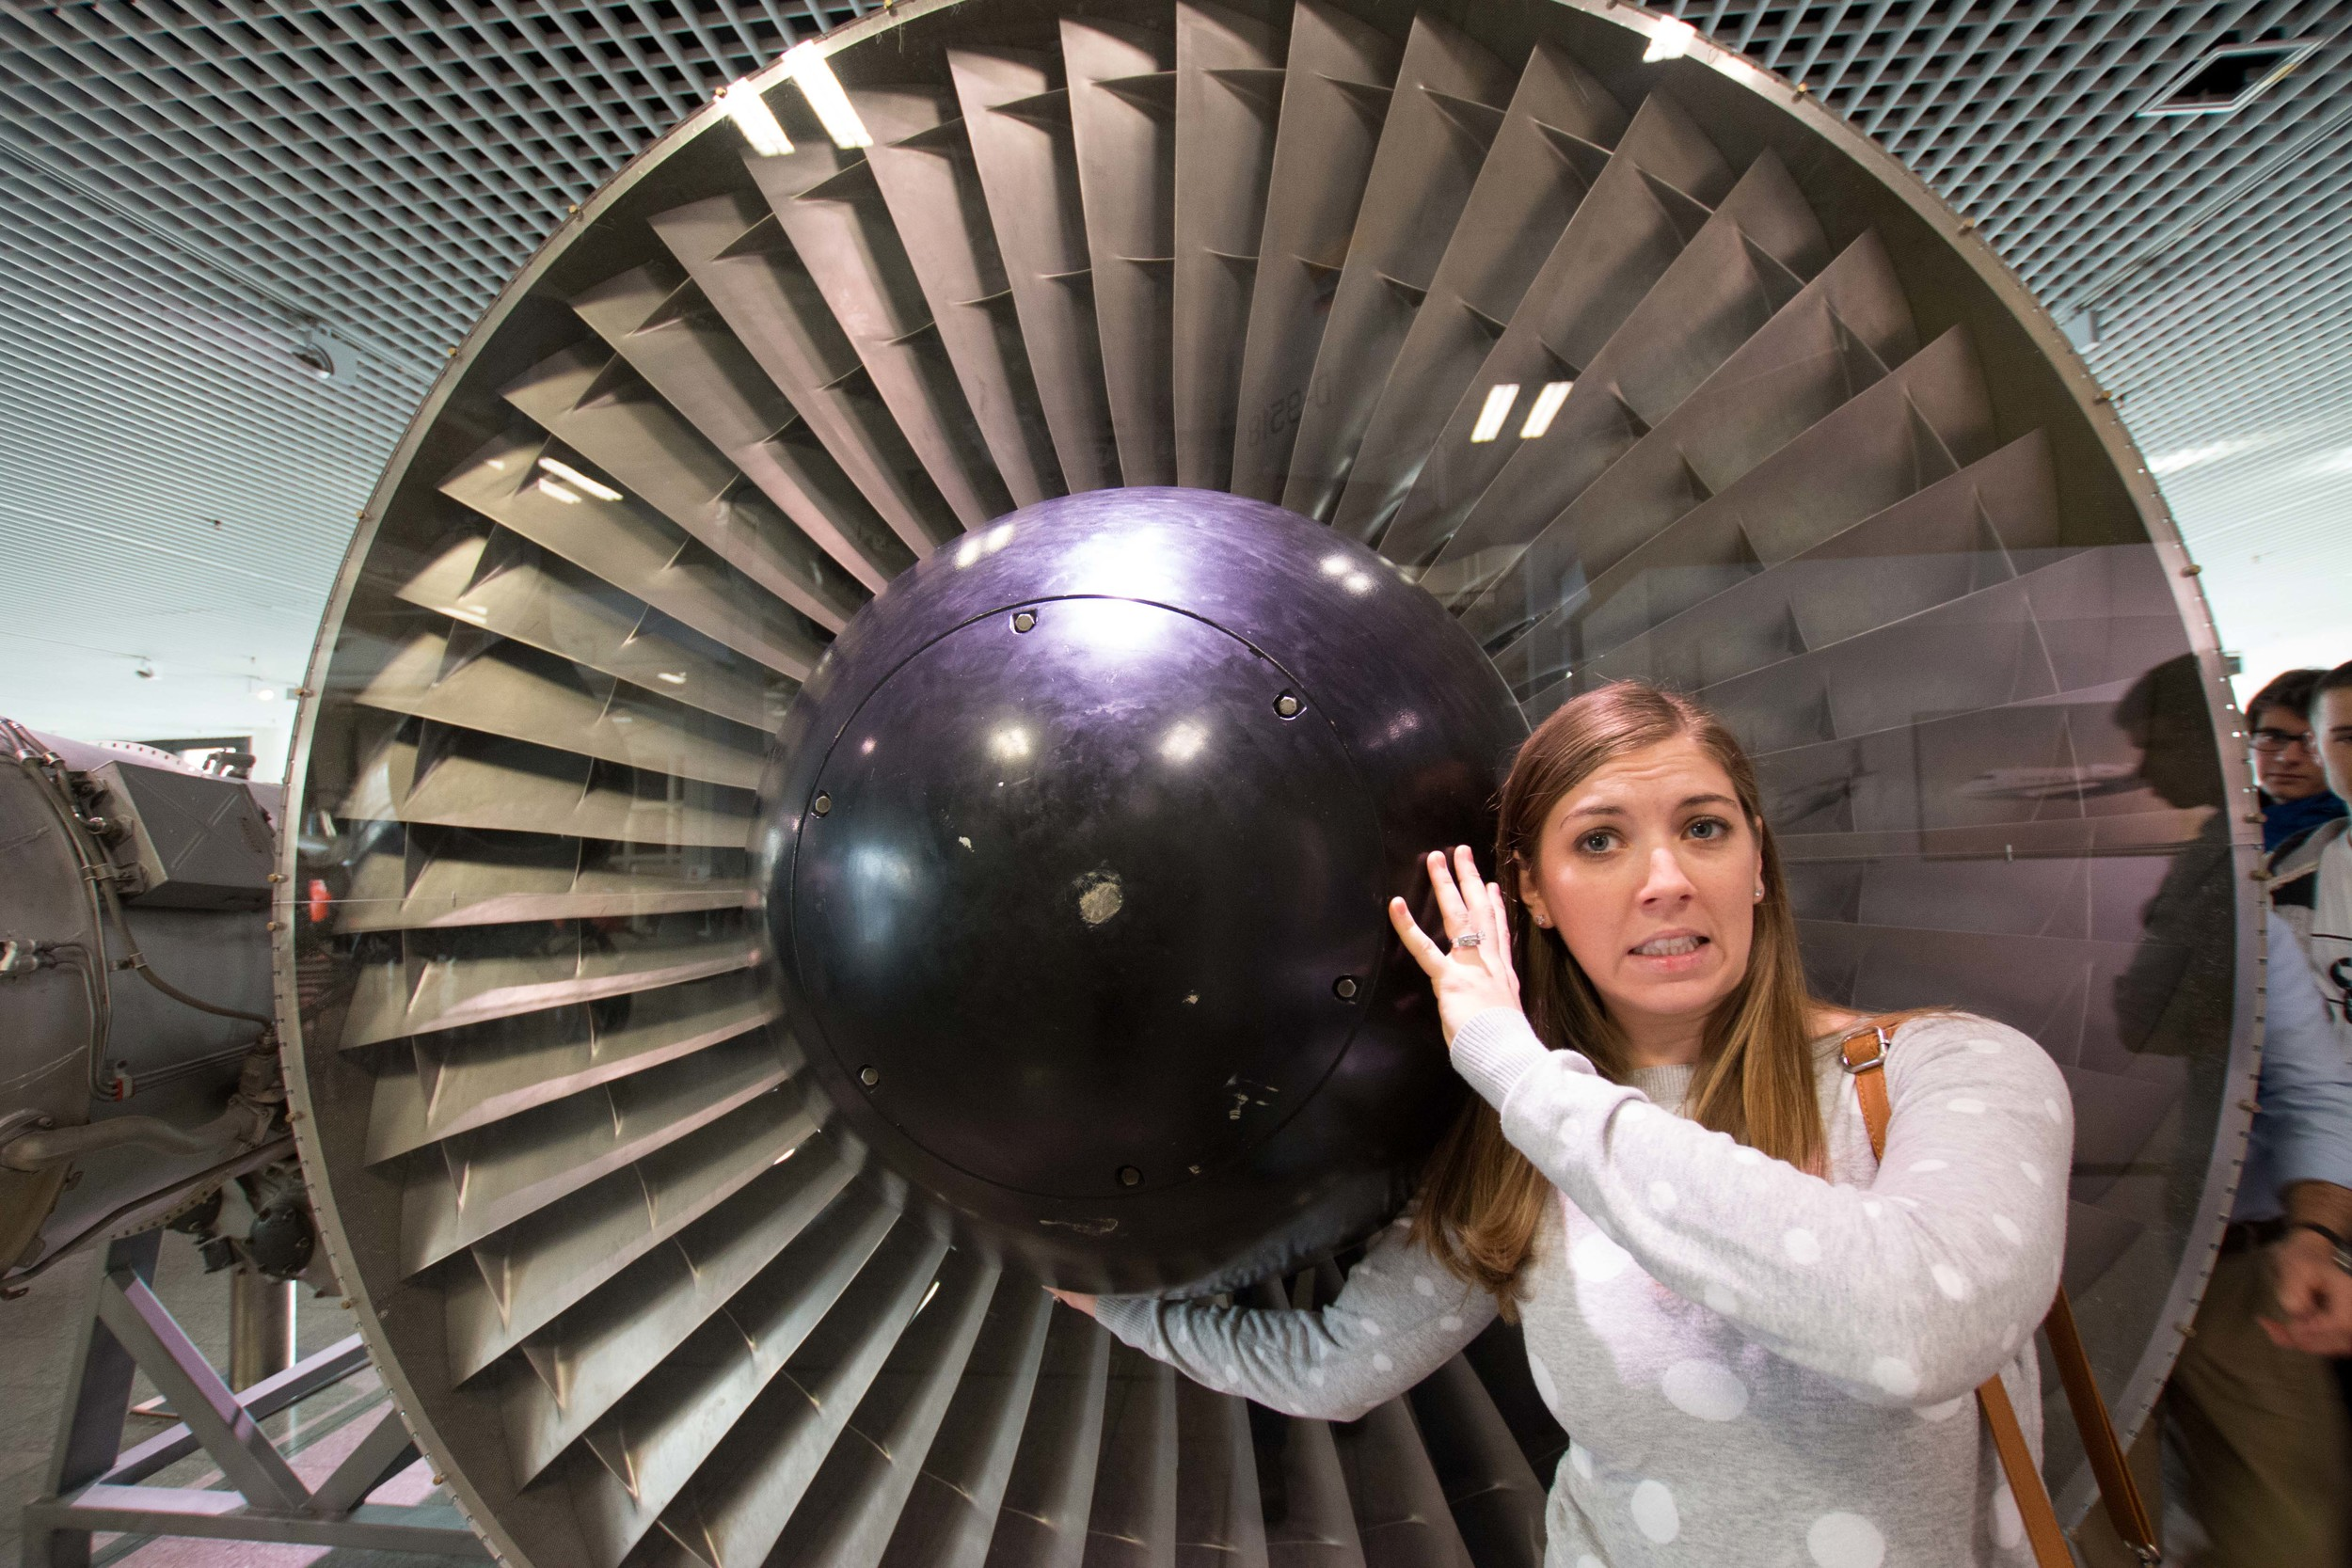 Meghan holding up a plane engine